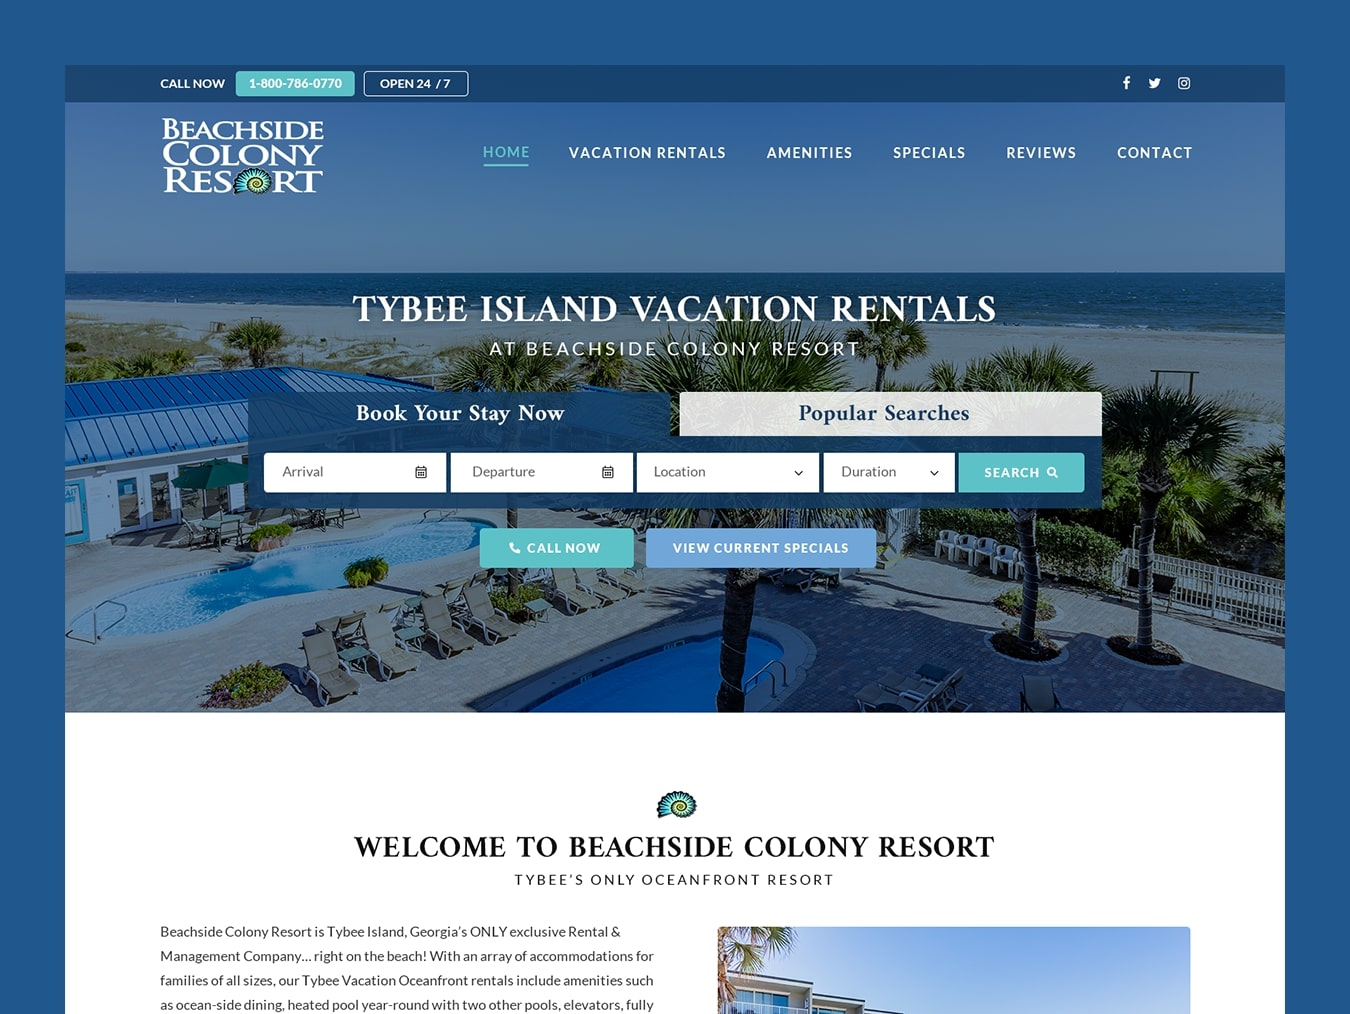 beachside-colony-resort-web-design-featured